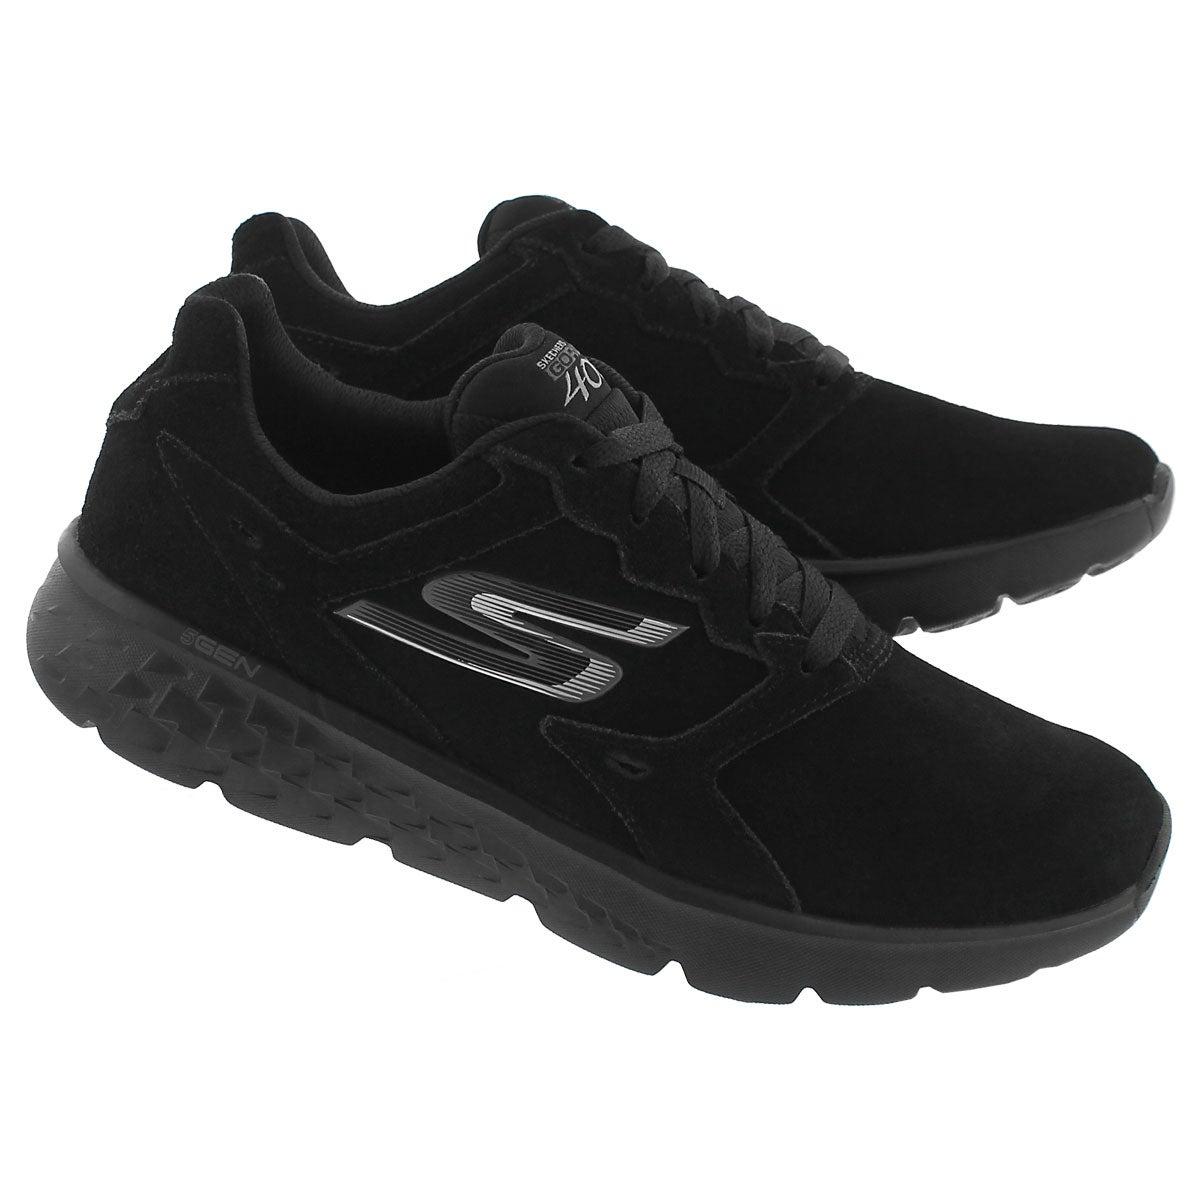 Lds GOrun 400 black lace up running shoe